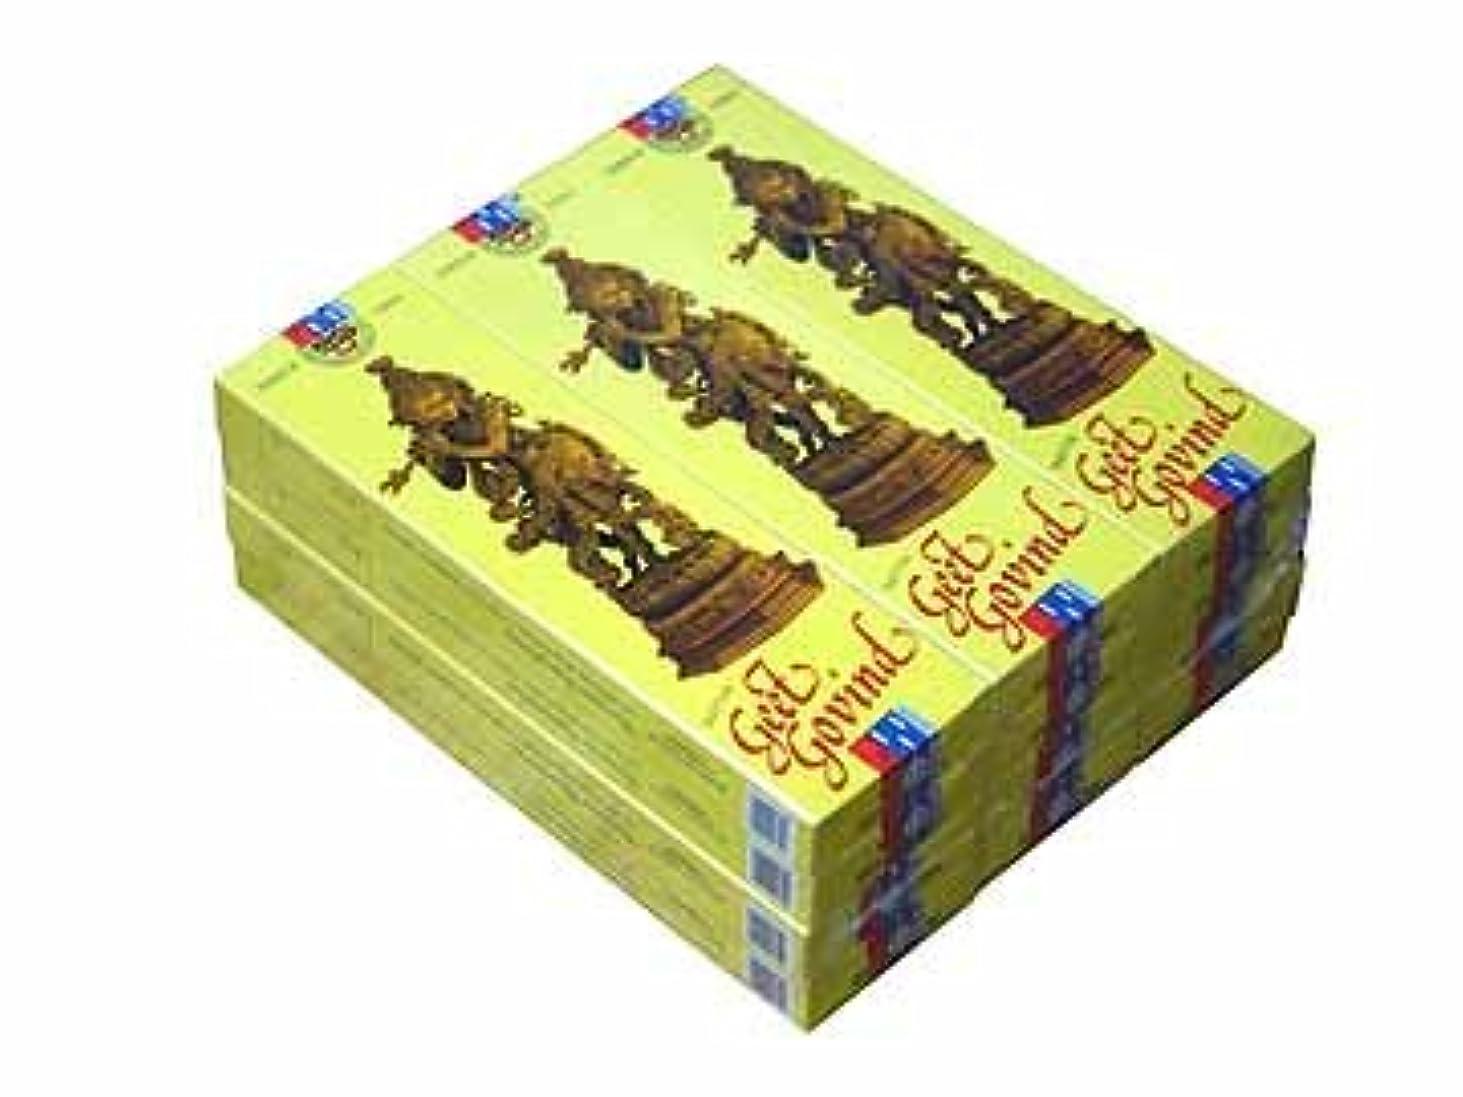 SATYA(サチャ) ギート ゴビンドゥ香スティック マサラタイプGEET GOVIND 12箱セット